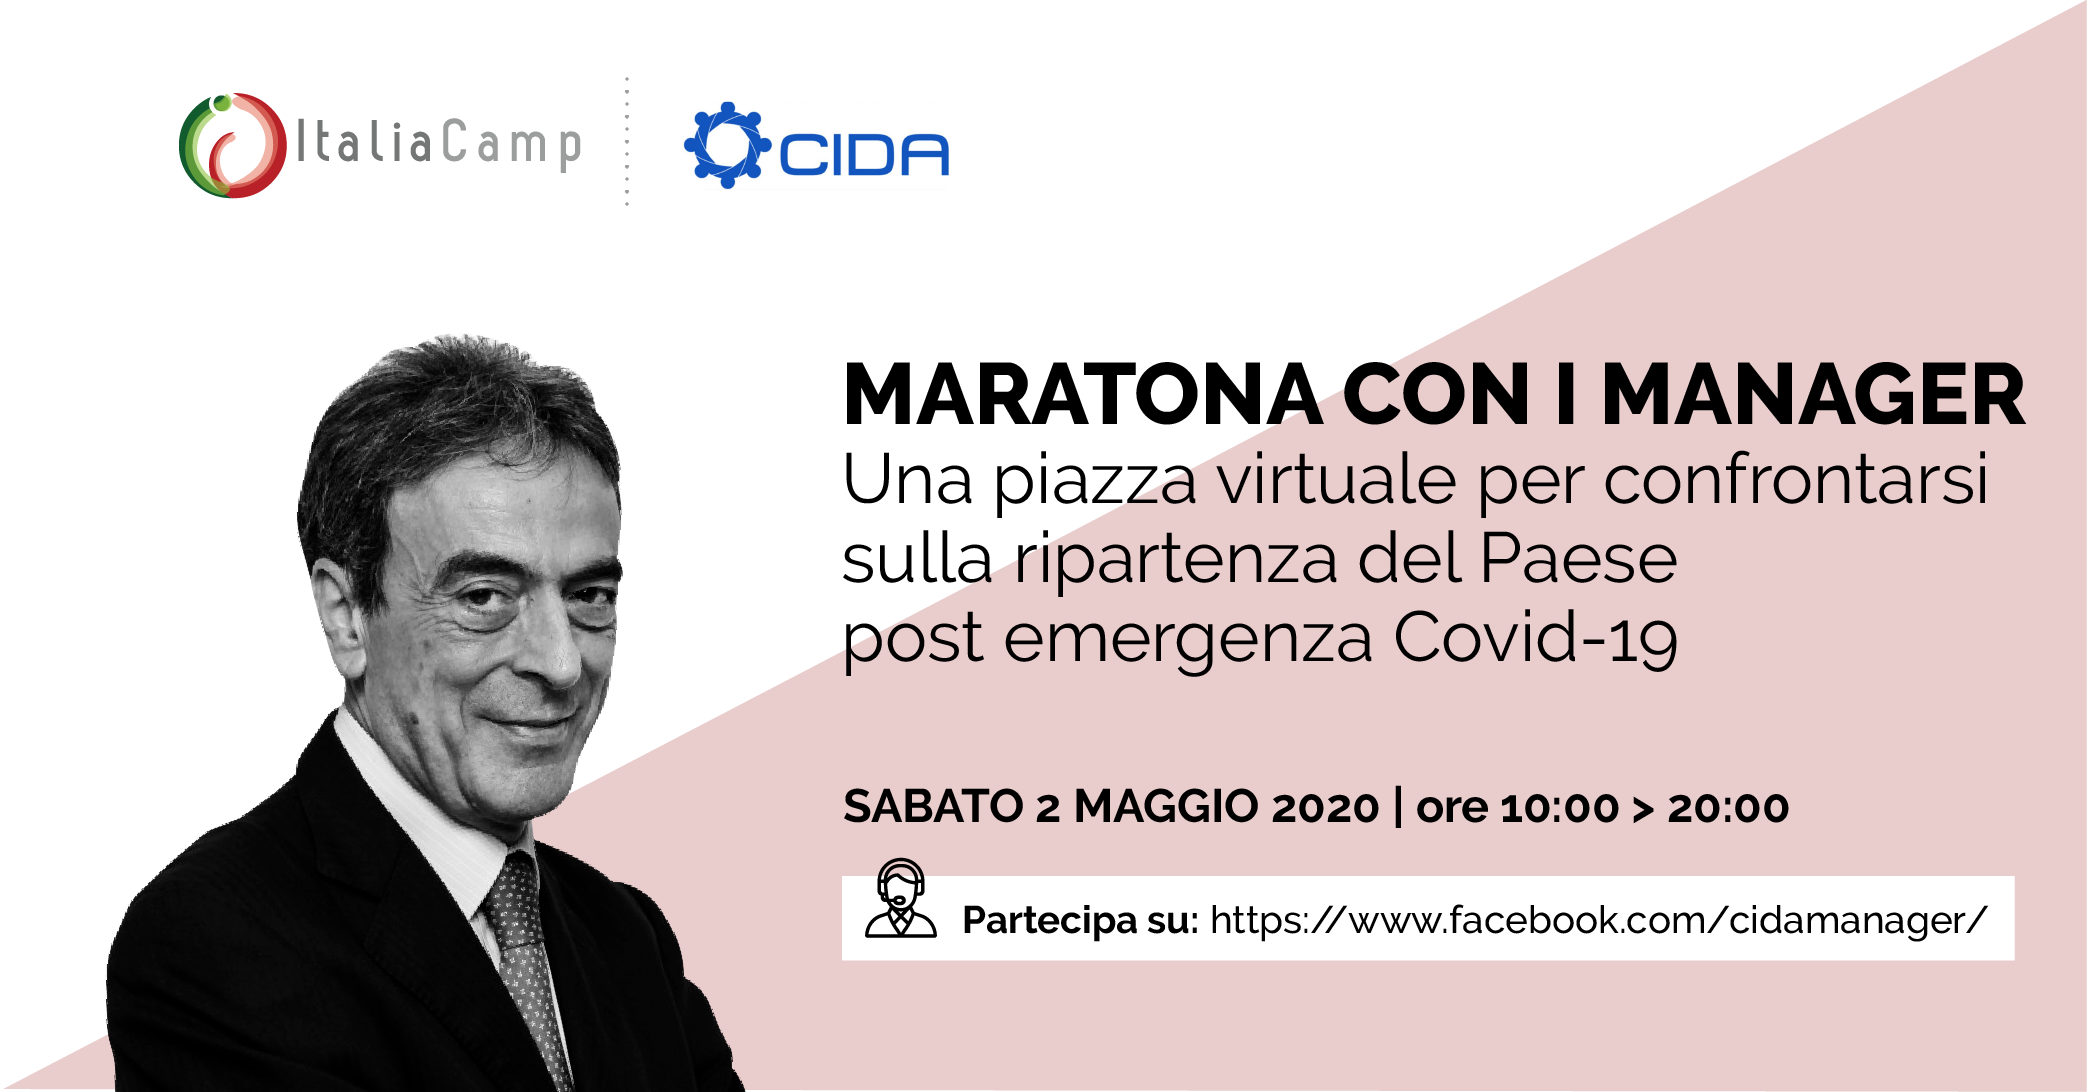 Luigi Mastrobuono Maratona con i Manager CIDA